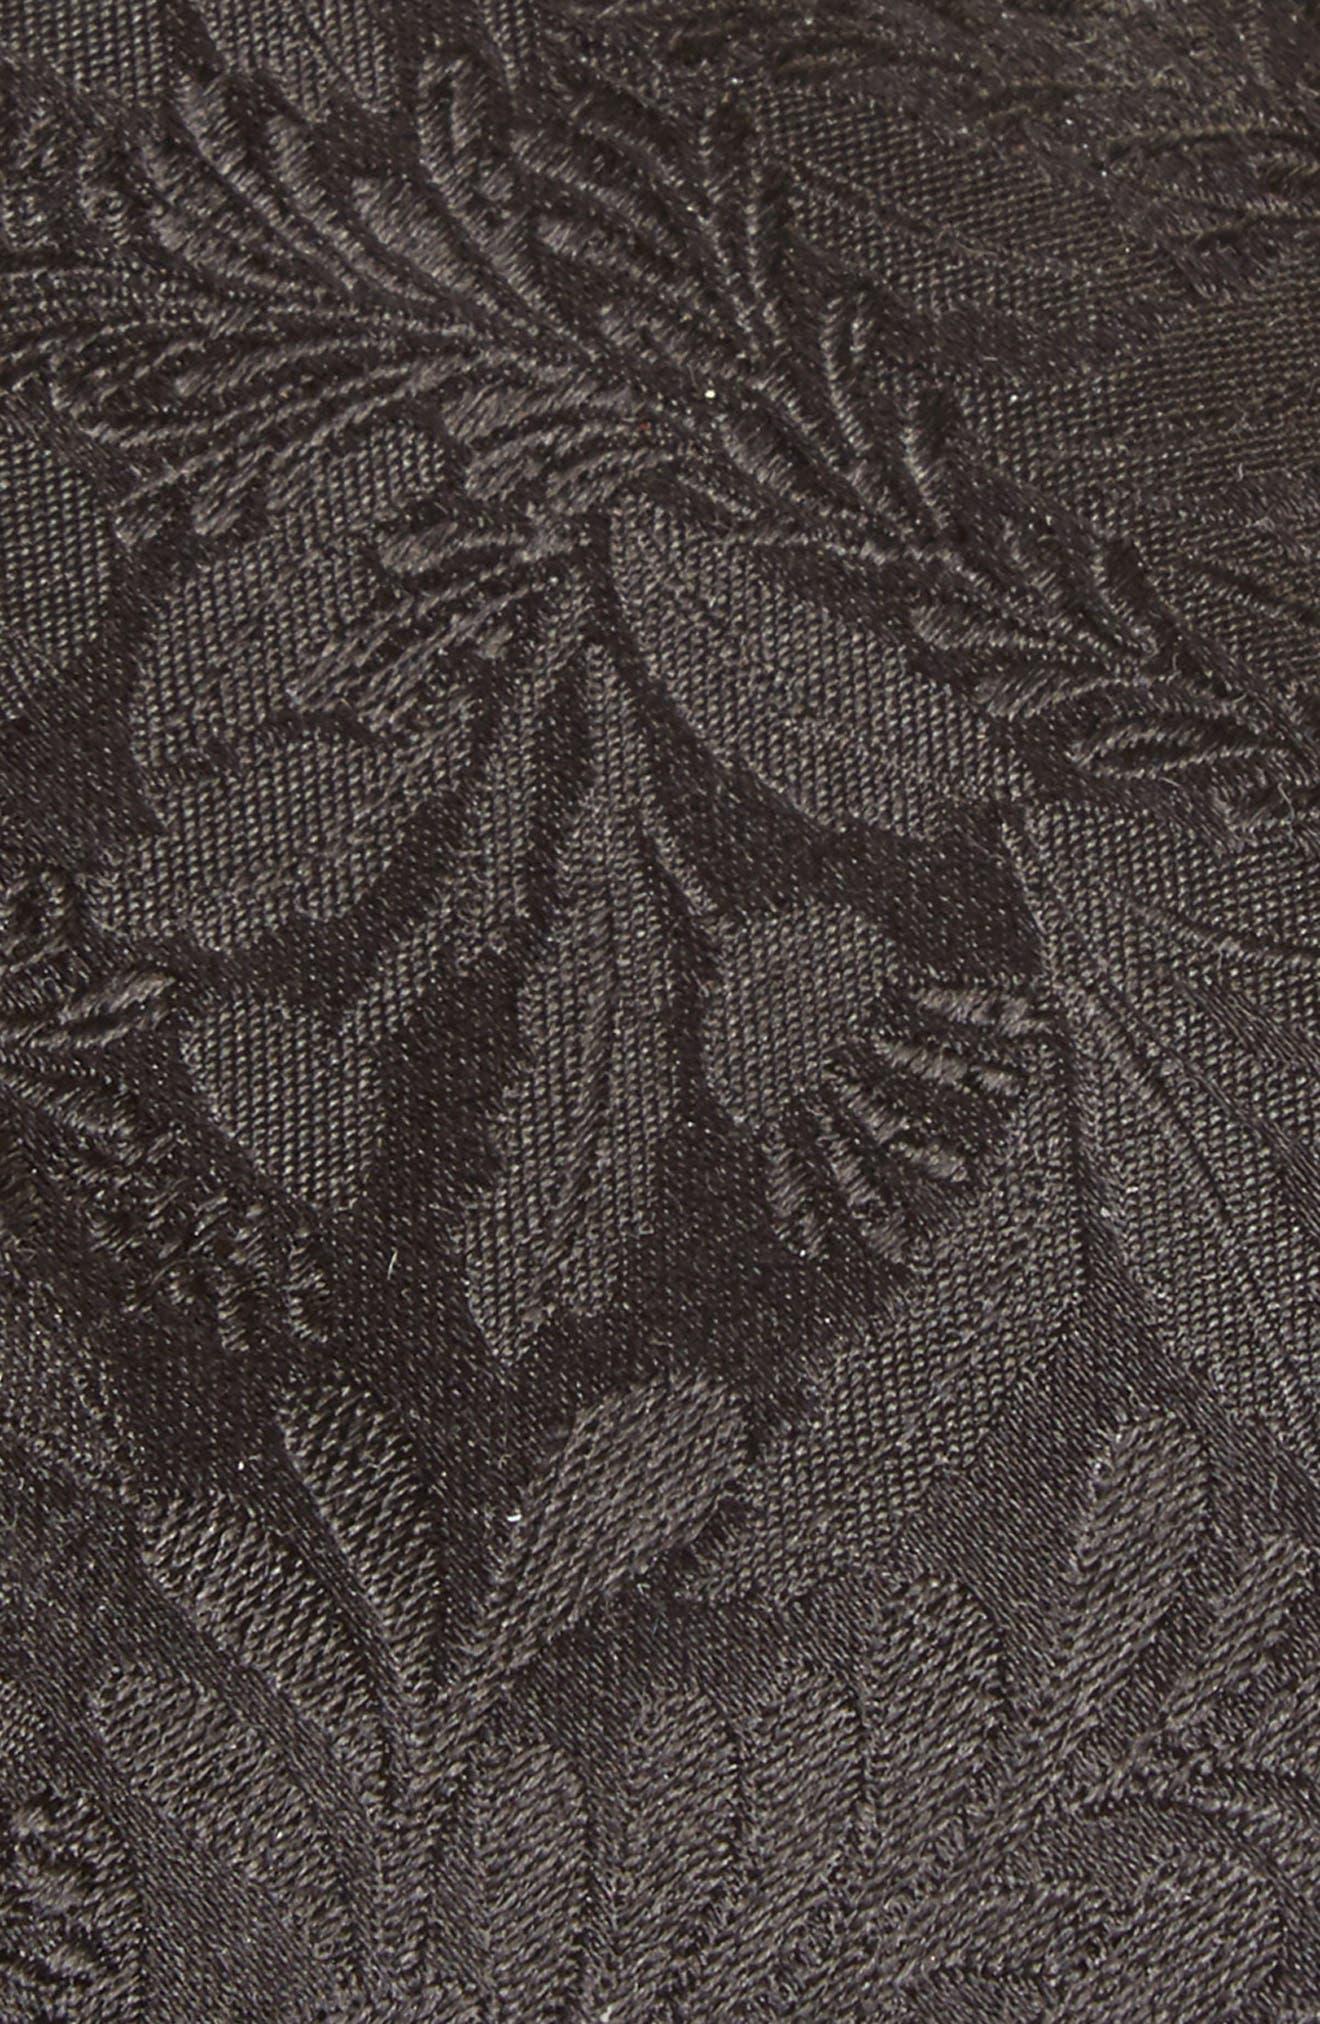 Tonal Floral Silk Tie,                             Alternate thumbnail 2, color,                             001